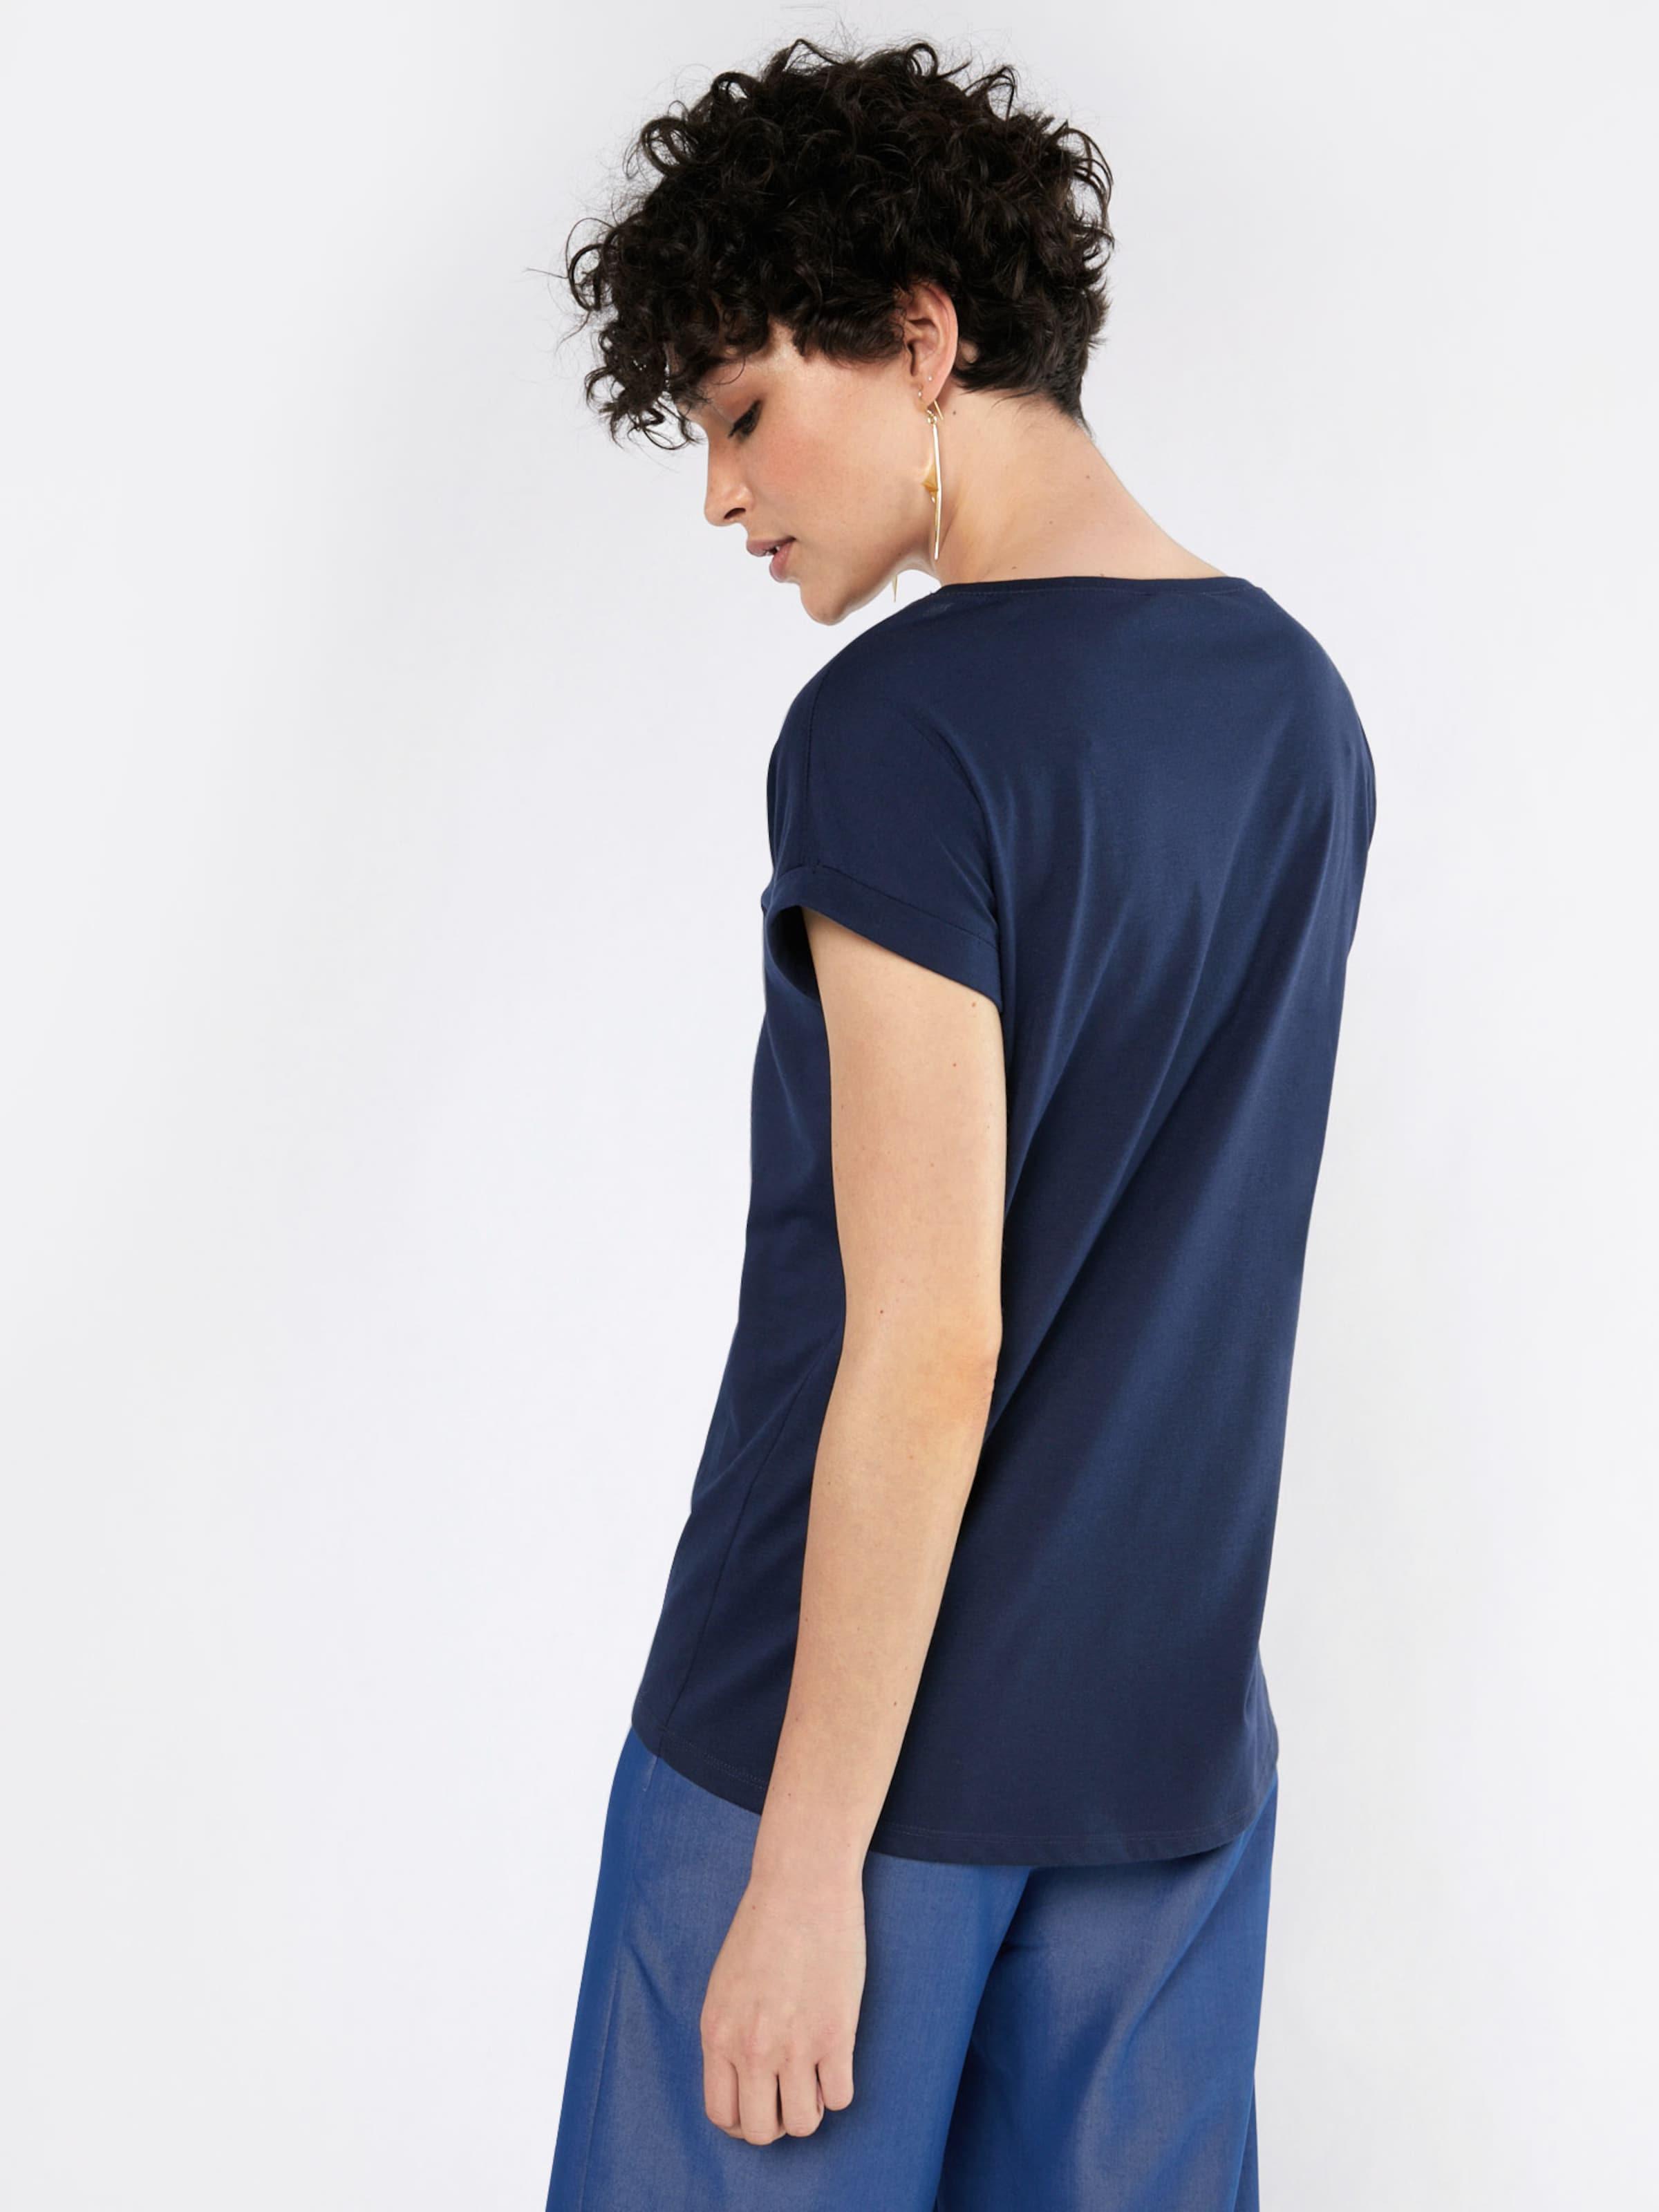 Shirt Shirt Nachtblau In Vila 'dreamers' In Nachtblau Vila Shirt 'dreamers' 'dreamers' Vila 8wOmyn0Nv